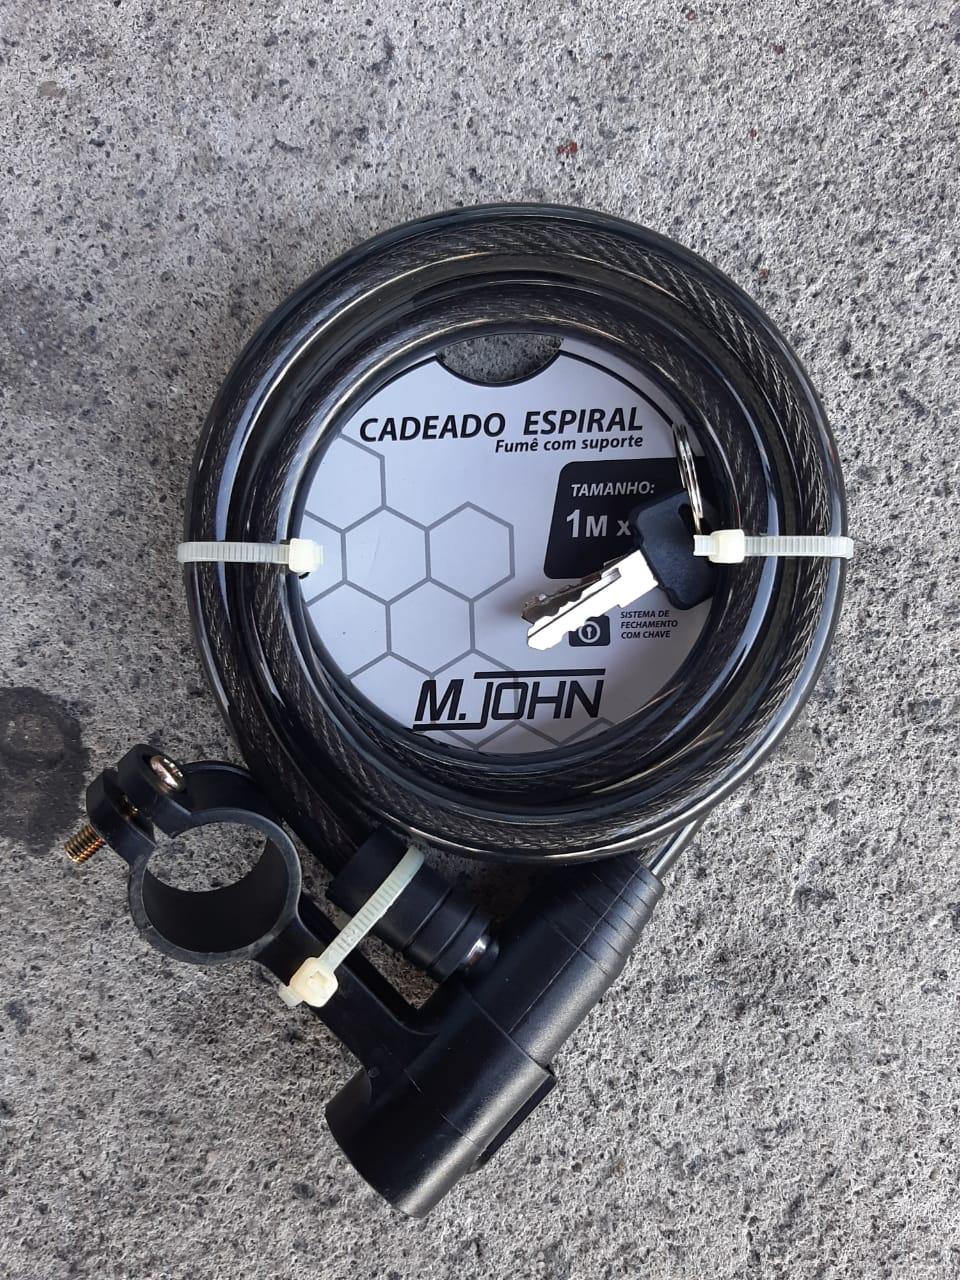 Cadeado Espiral Fumê Chaves Cabo Aço 1mt x 12mm Bike Moto